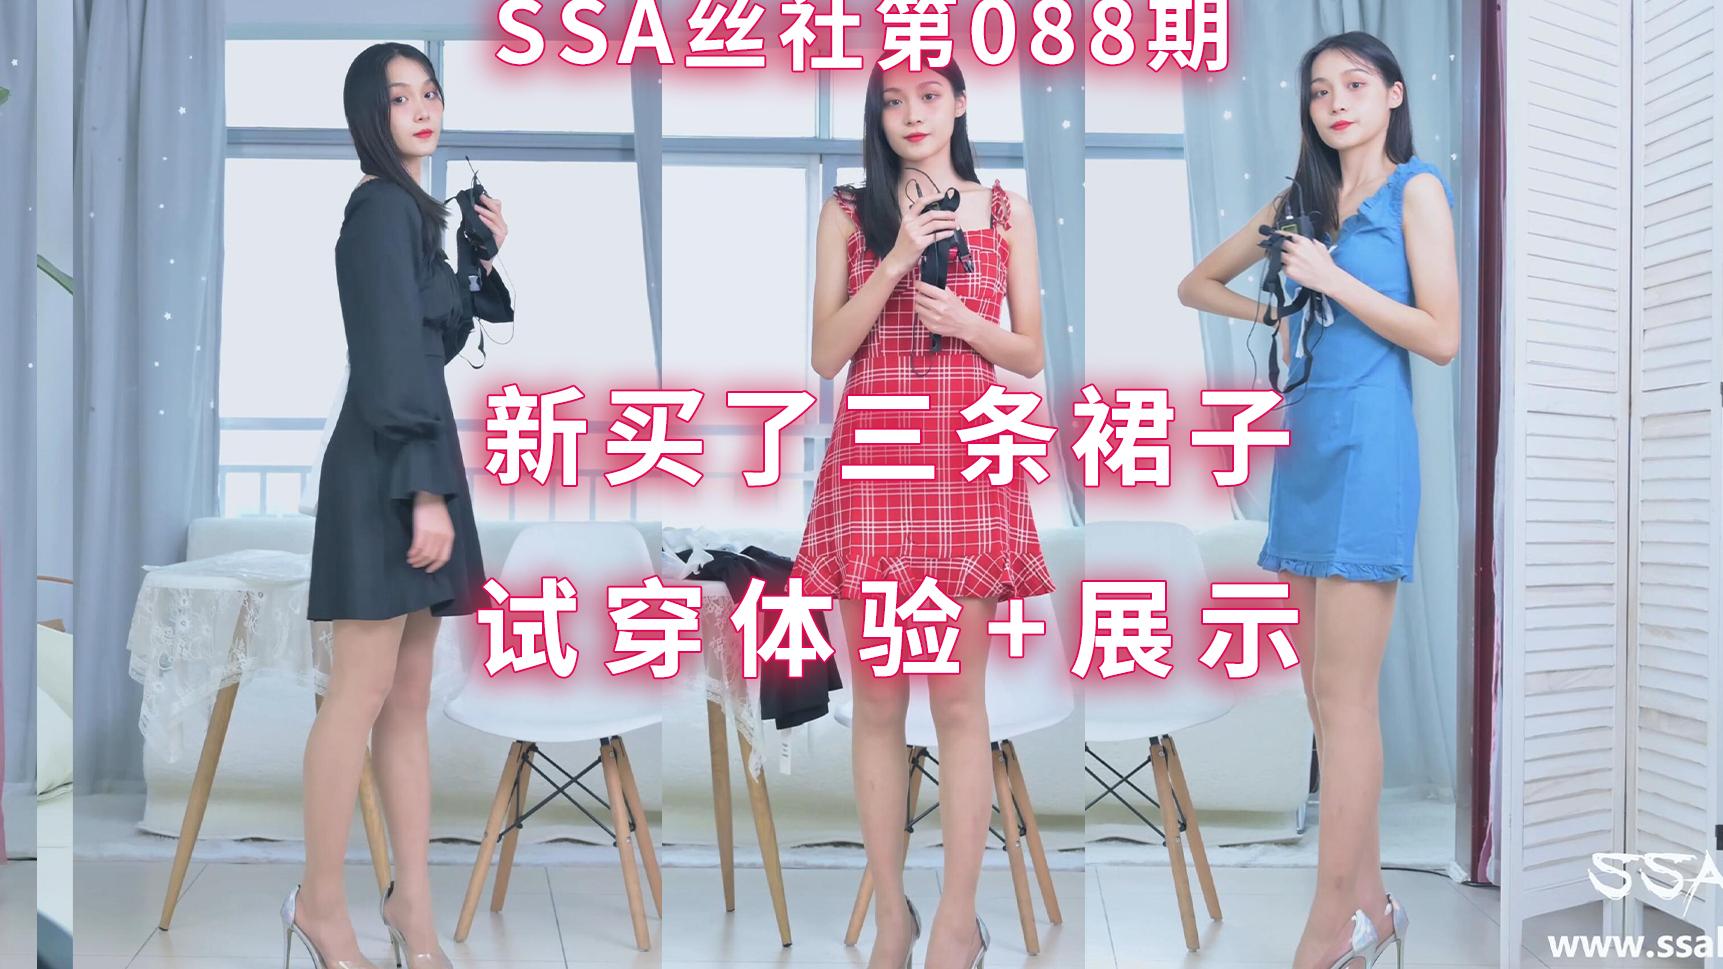 【SSA丝社】又买了三条新裙子,不务正业系列评测(88期)